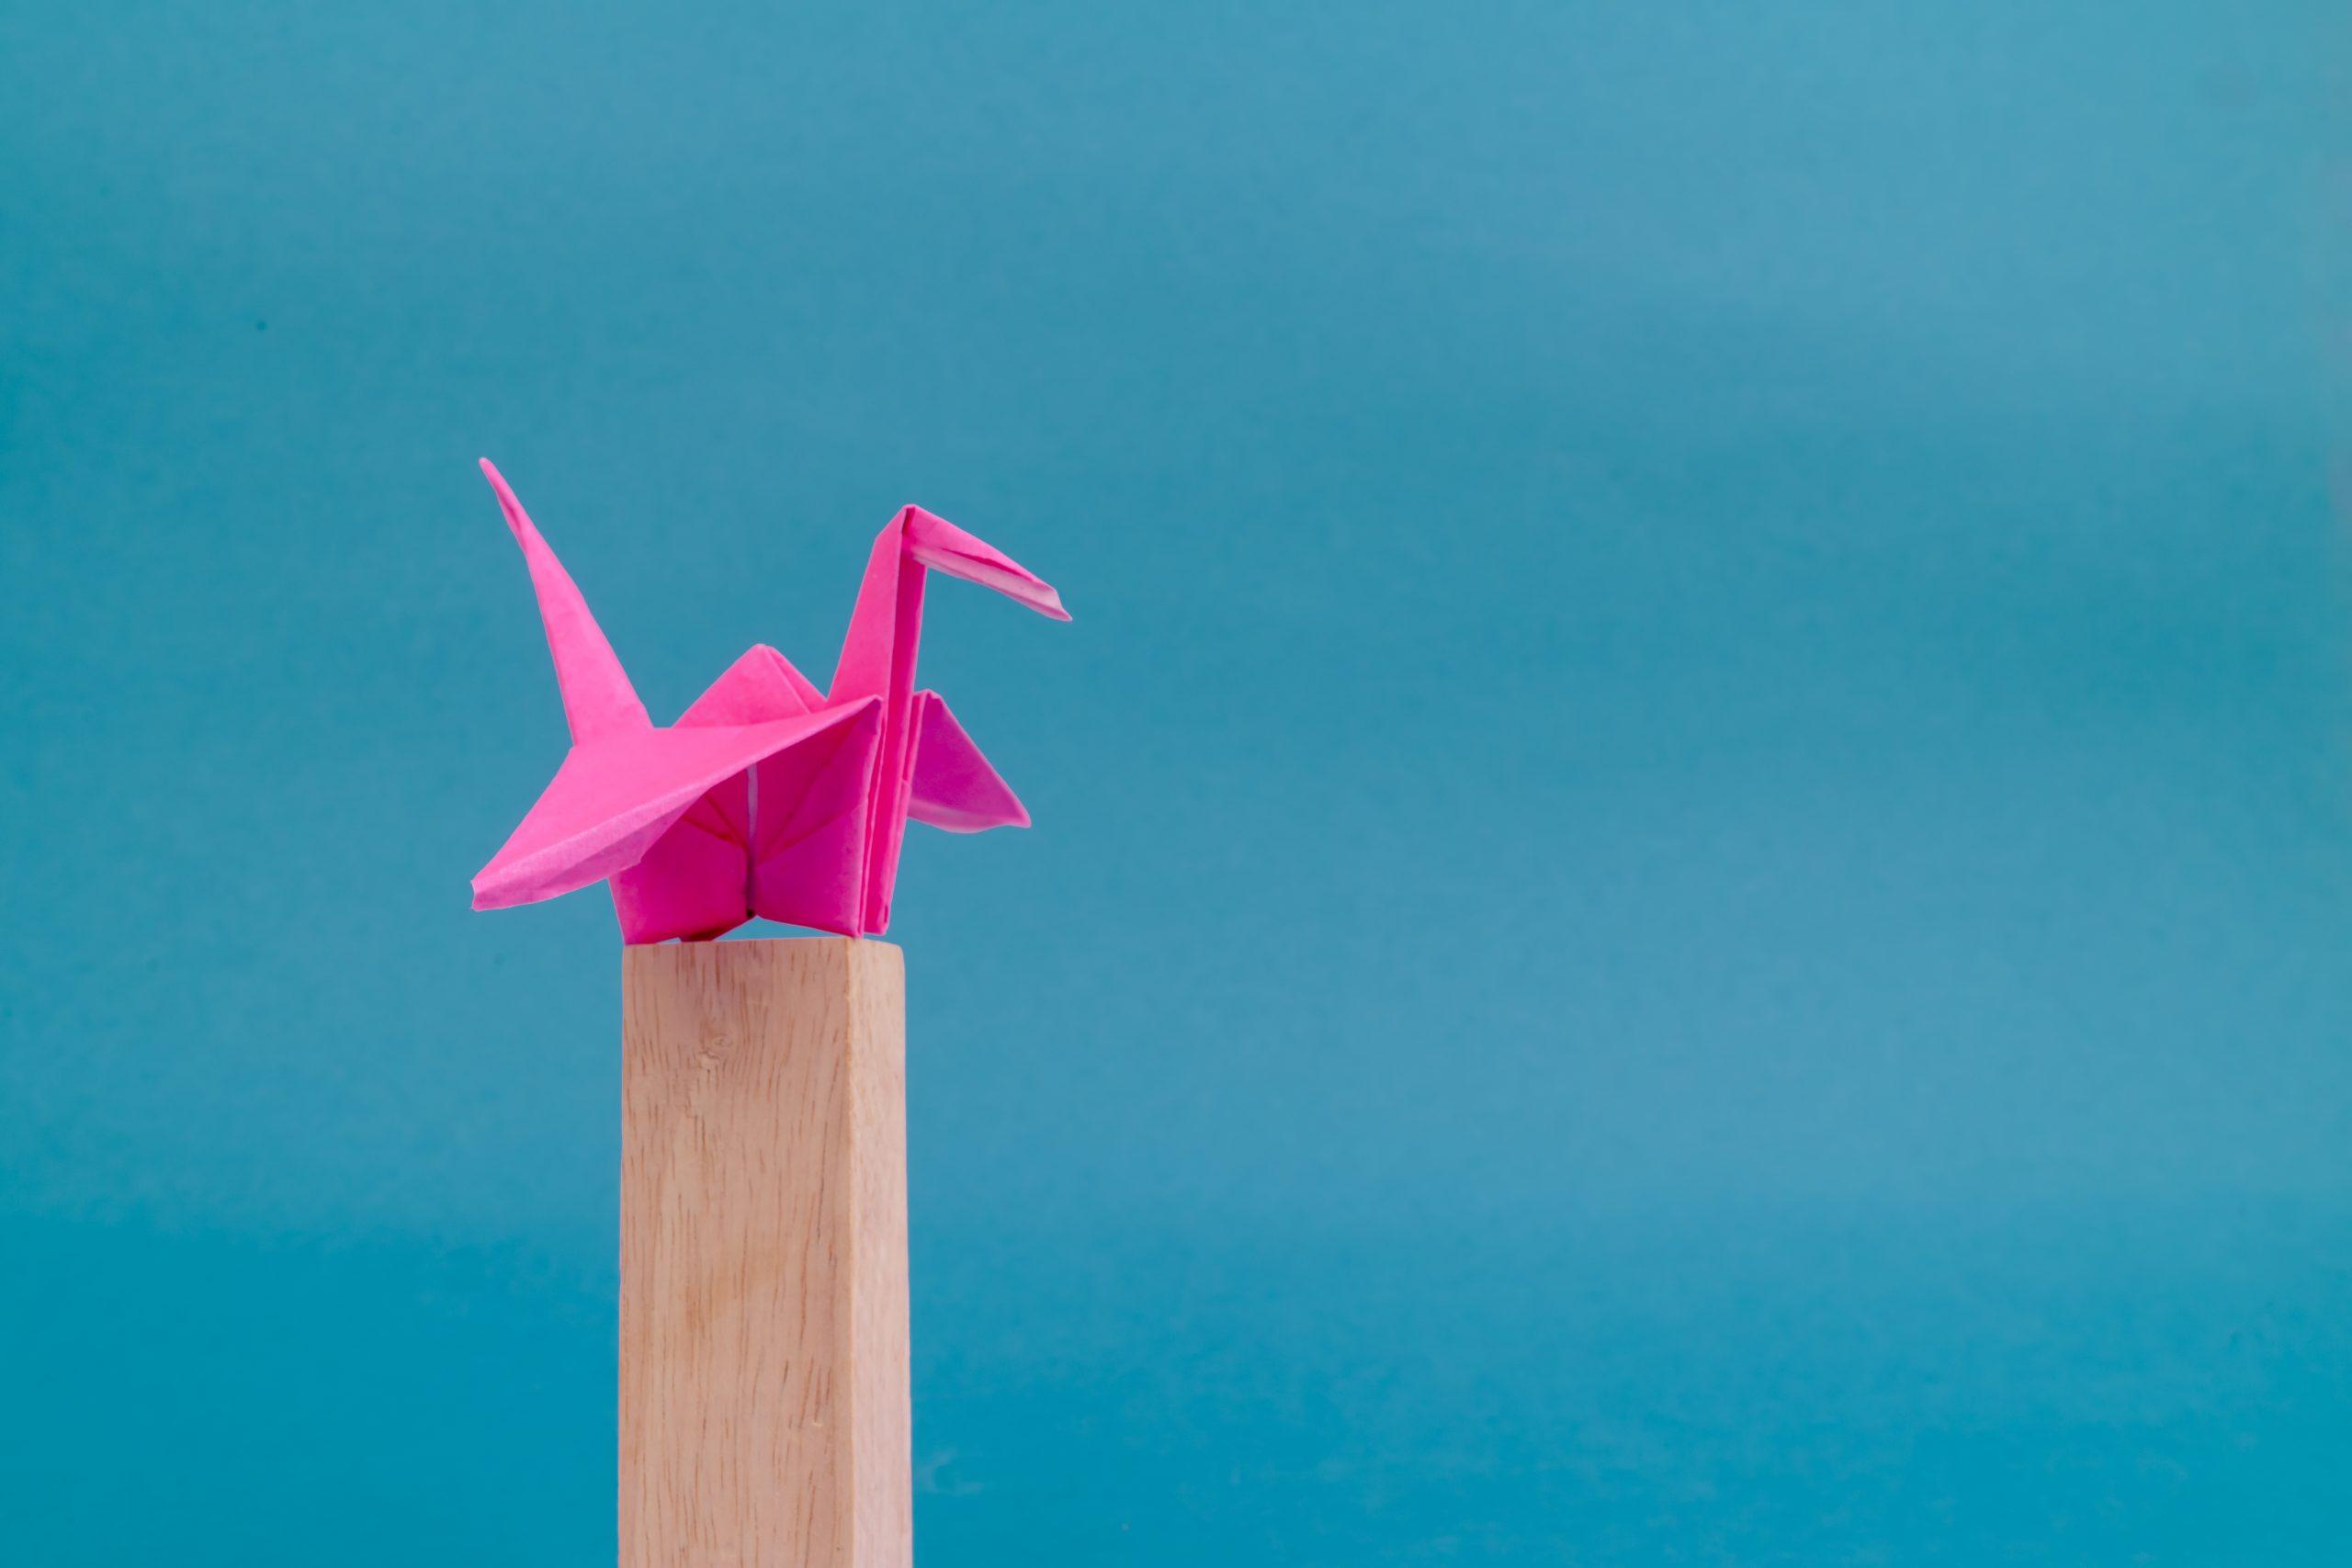 Origami crane on wooden block